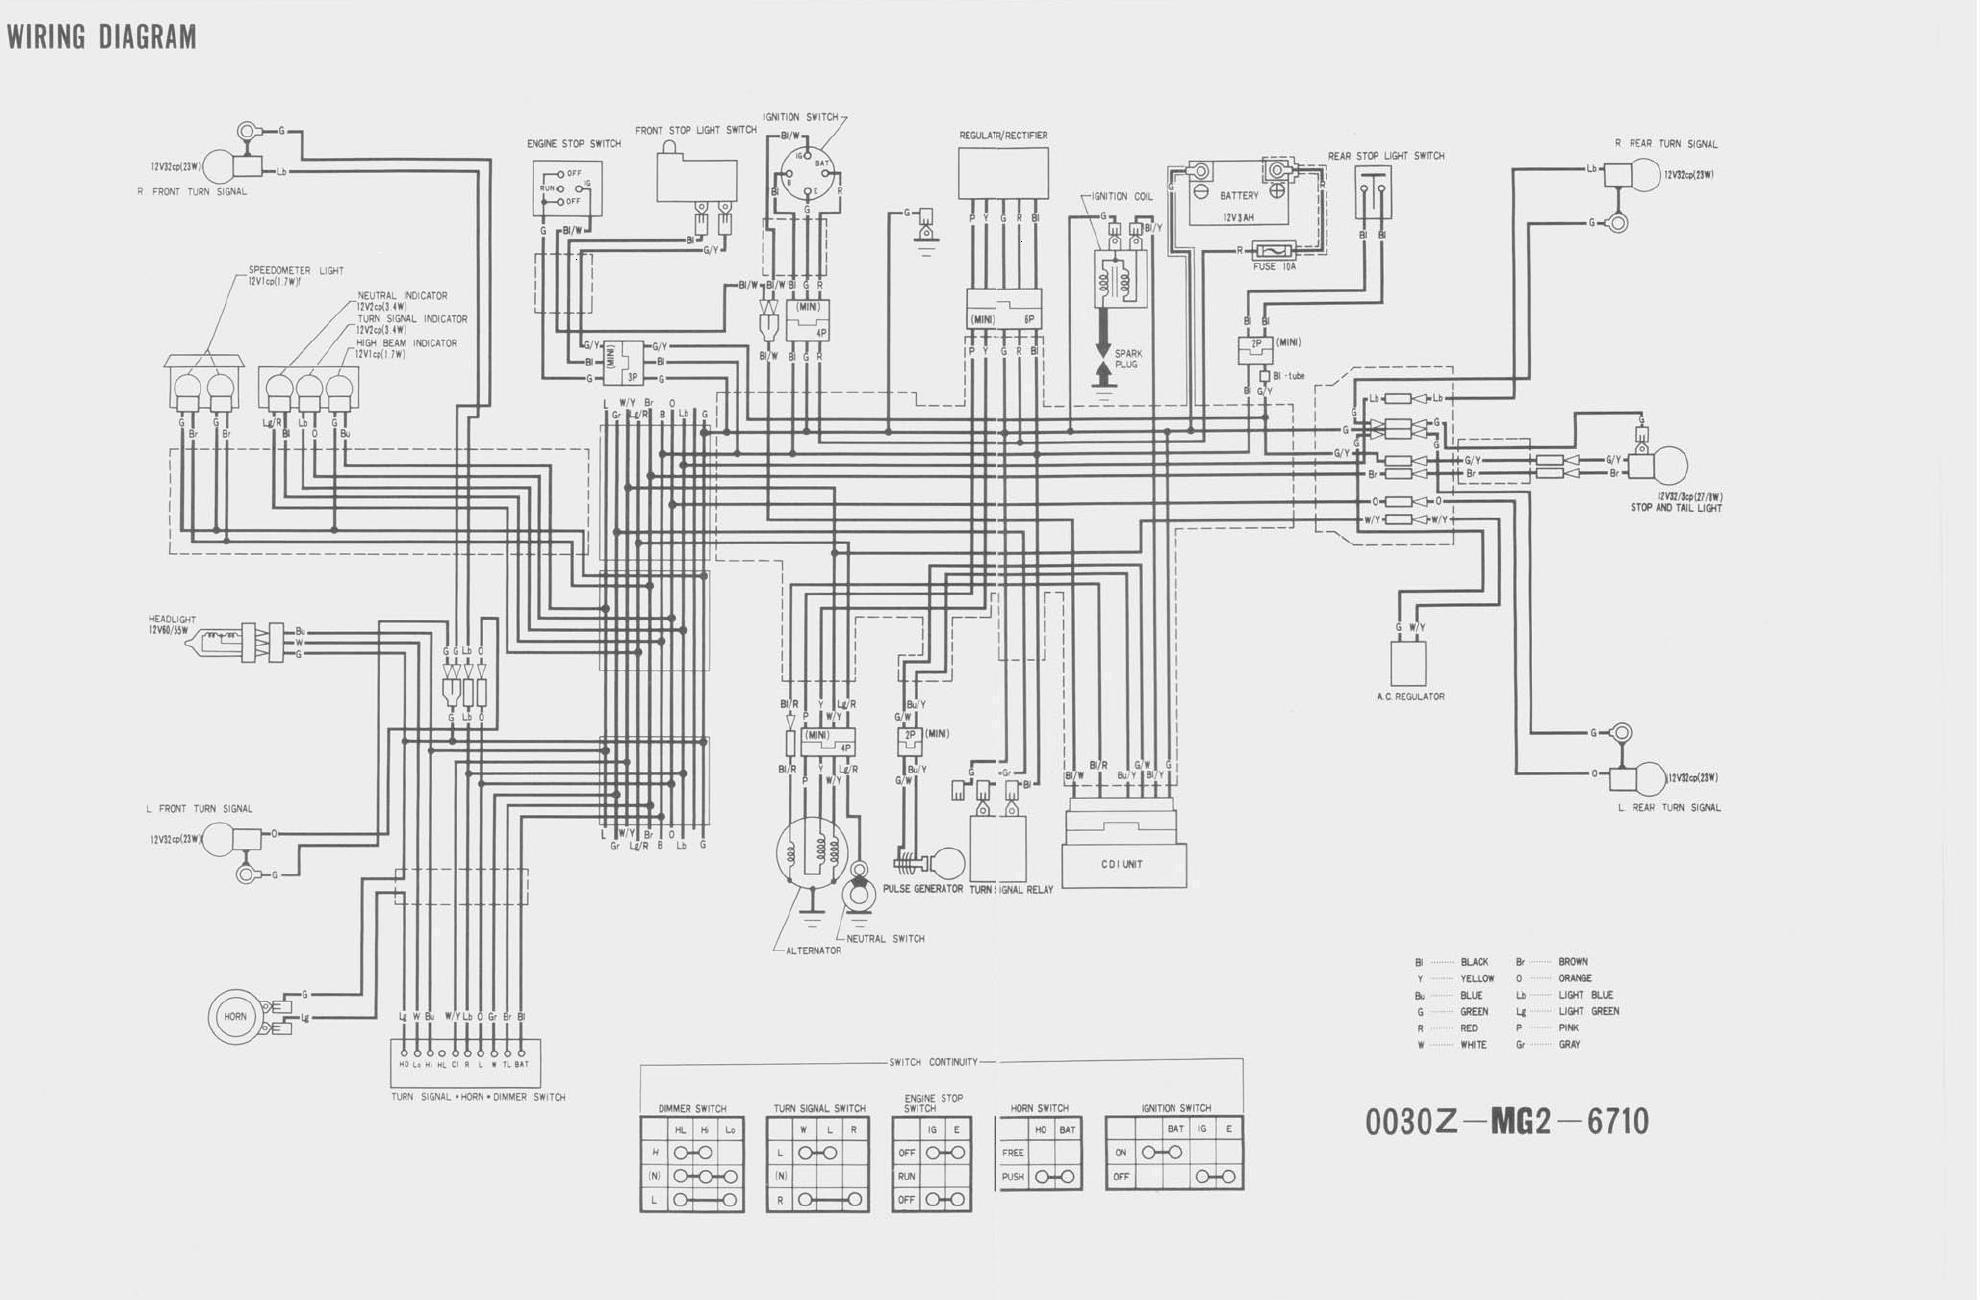 wiring diagram creator dump trailer pump honda eu2000i generator free download